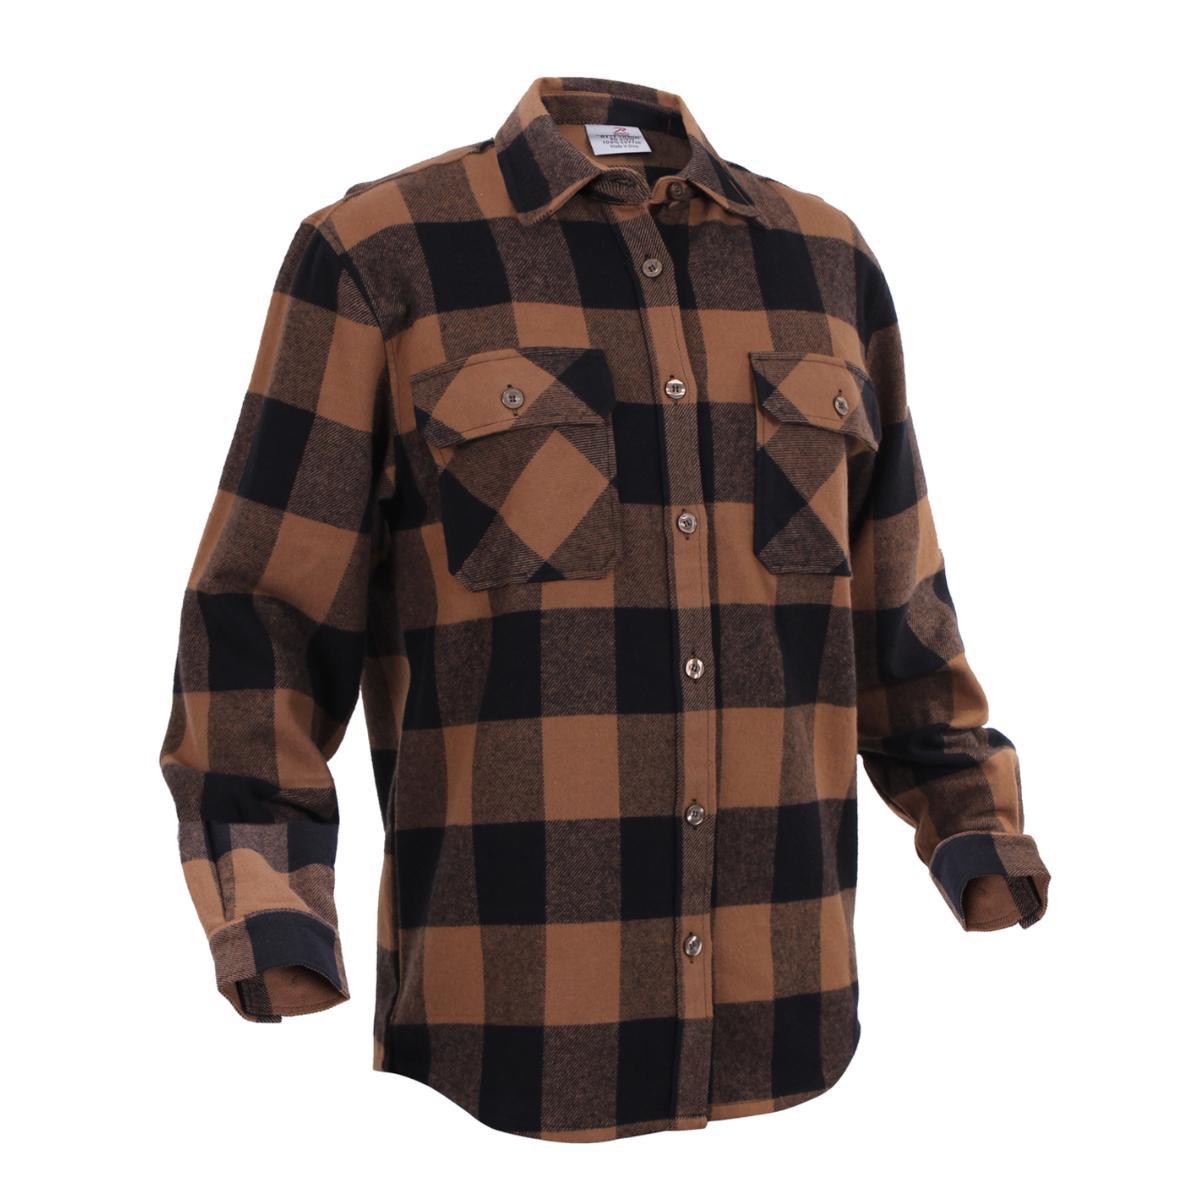 Plaid Long Sleeve Shirts For Men